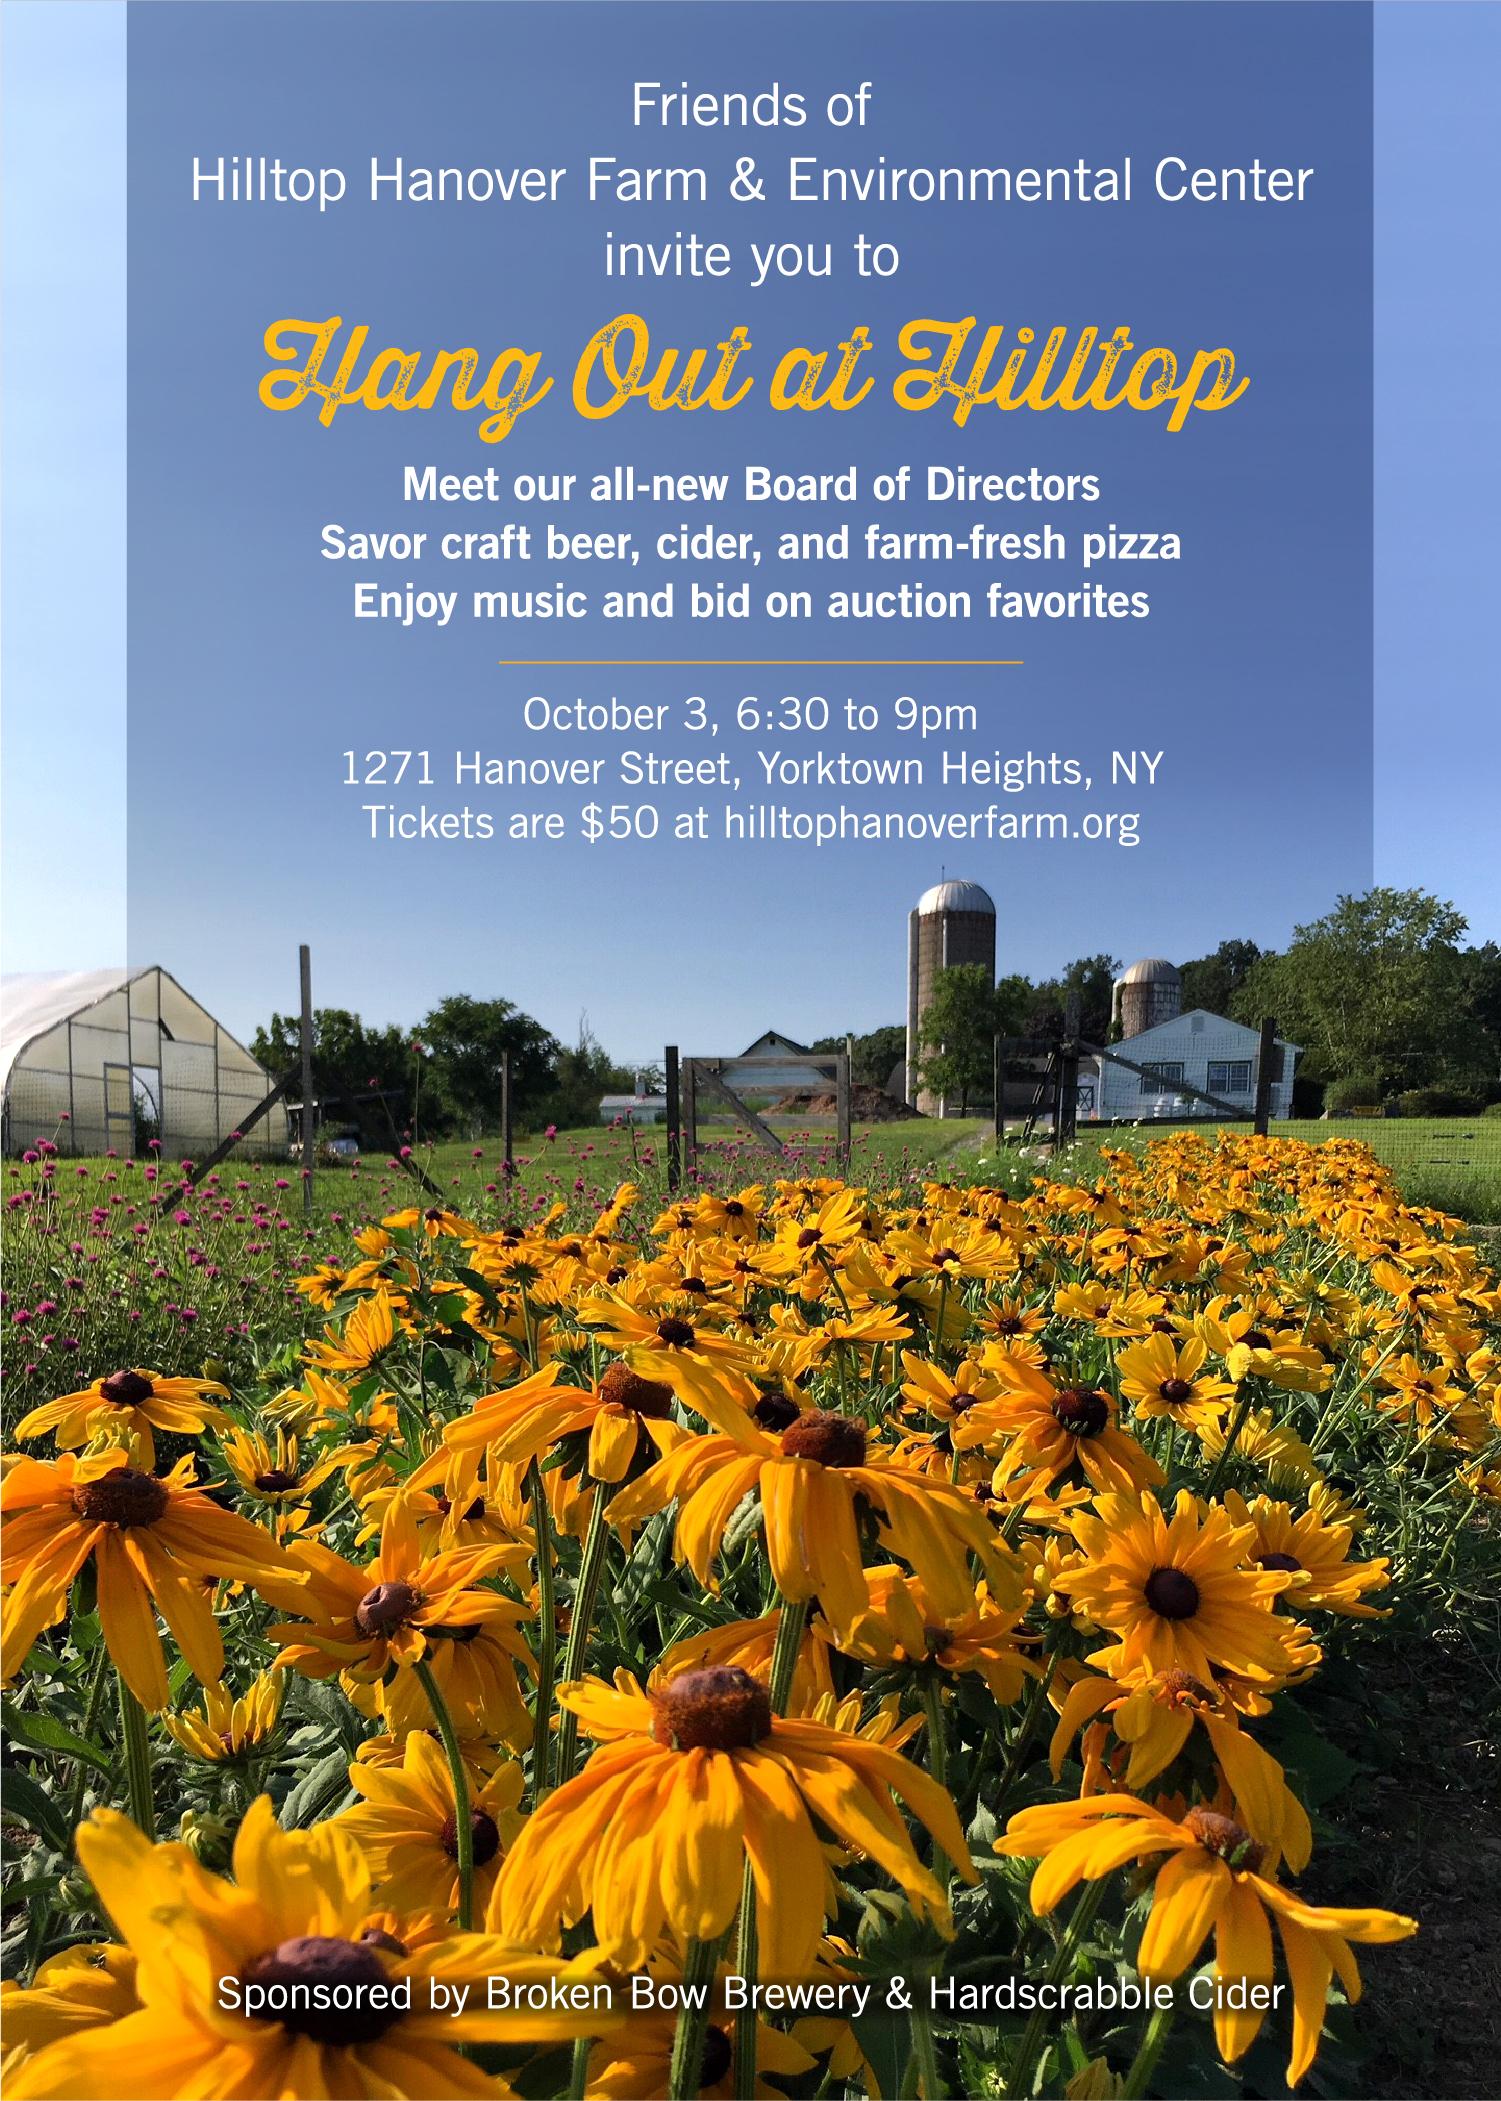 Hang Out at Hilltop